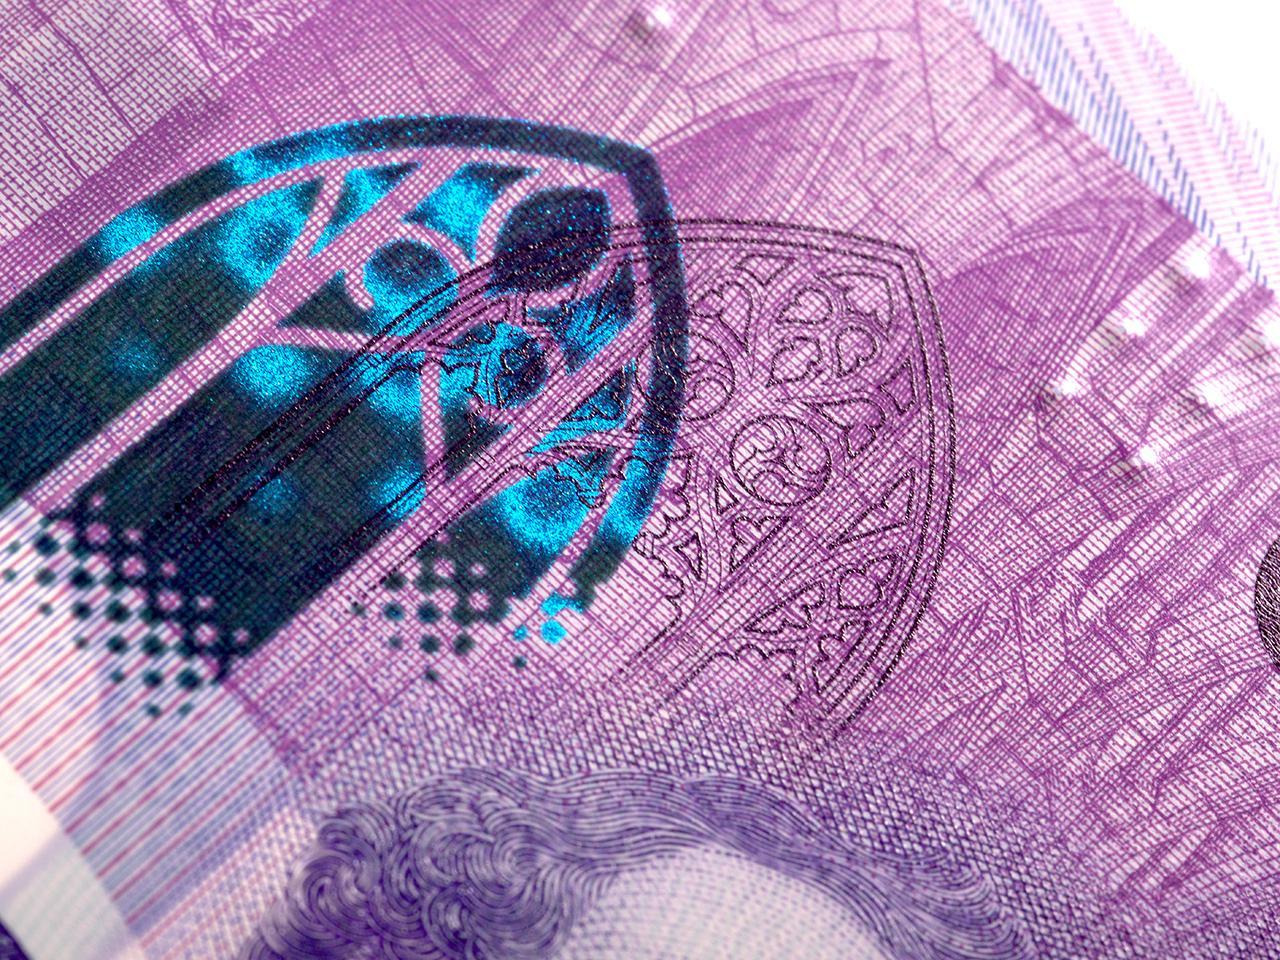 bank note image: gothic window